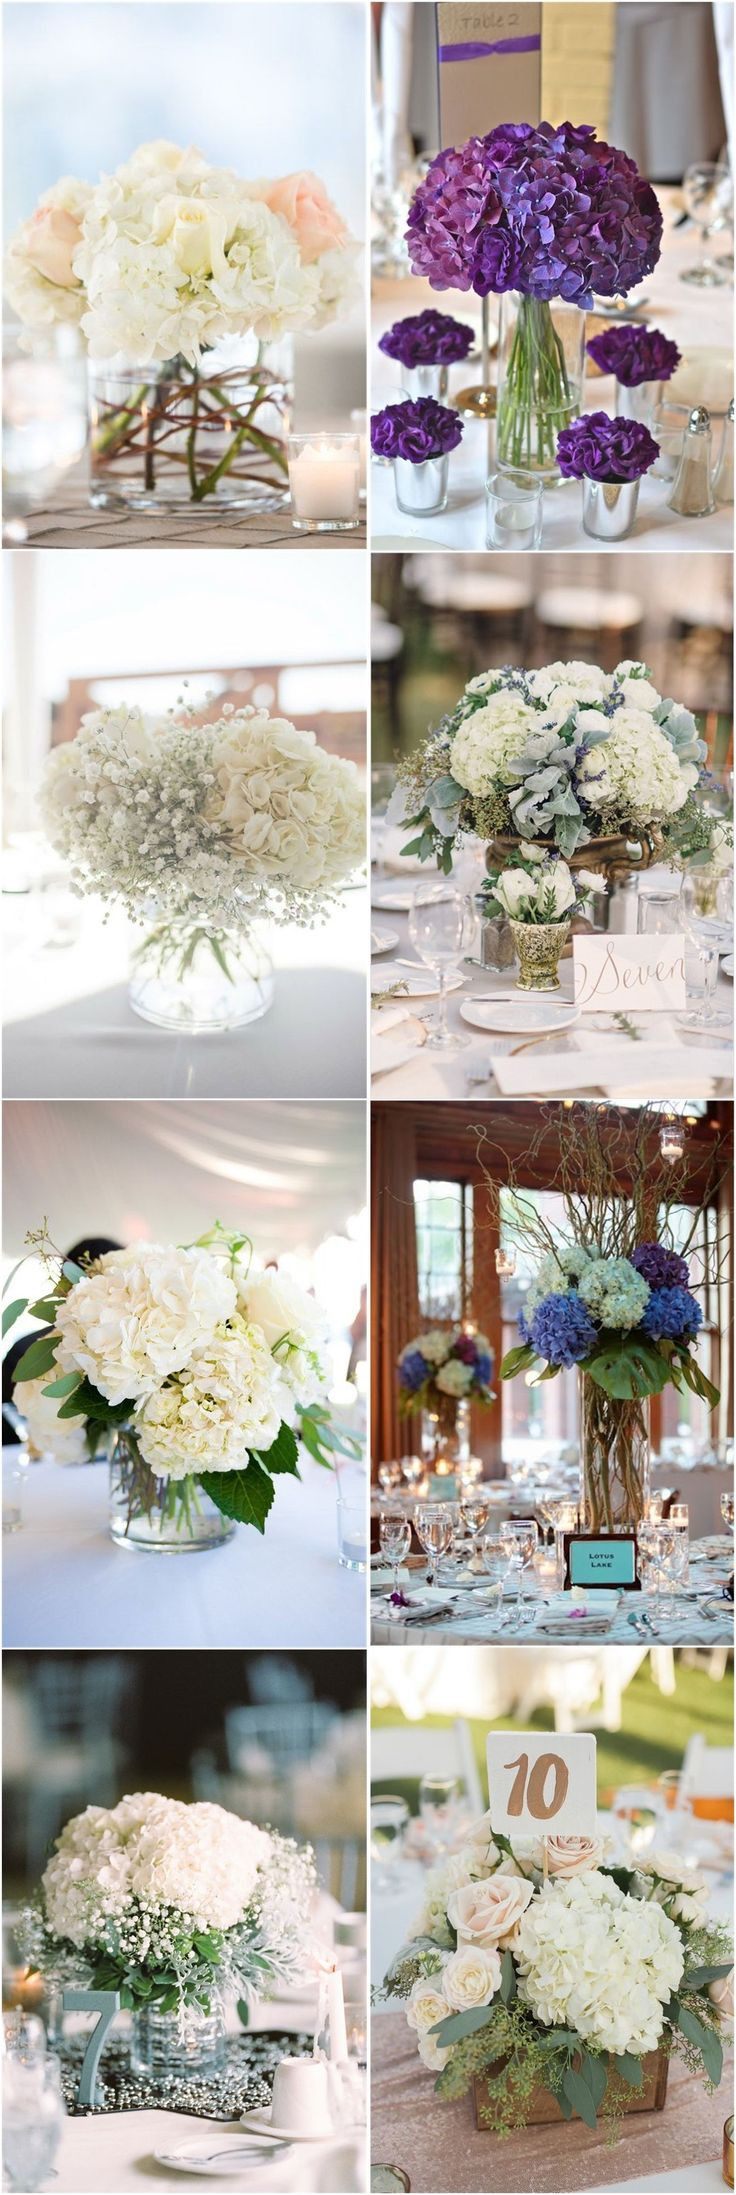 548 best Diy Wedding images on Pinterest | Wedding ideas, Wedding ...